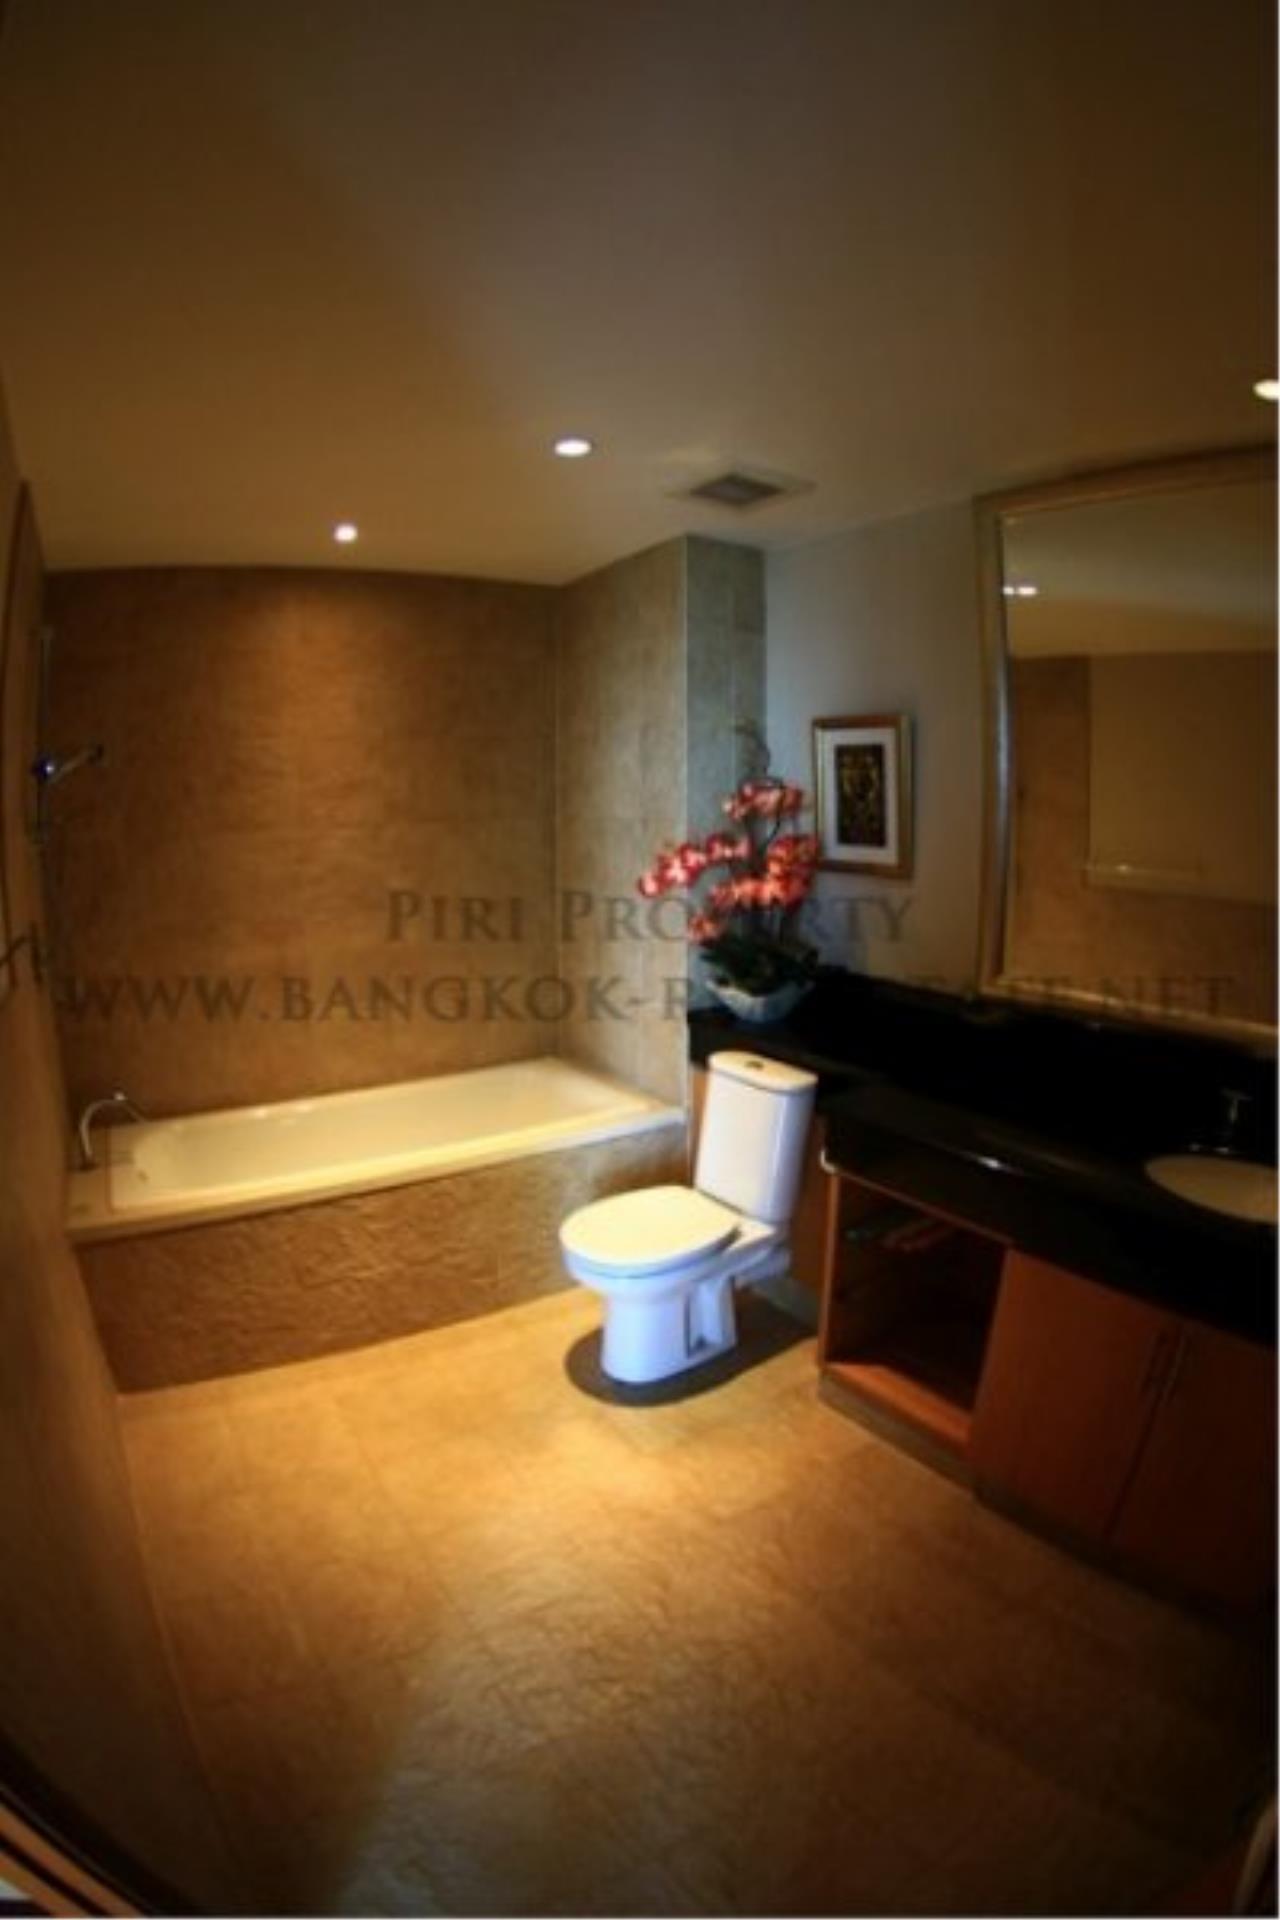 Piri Property Agency's Ascott Sathorn - 2 Bedroom Condo on high Floor for Sale - 109 SQM 4